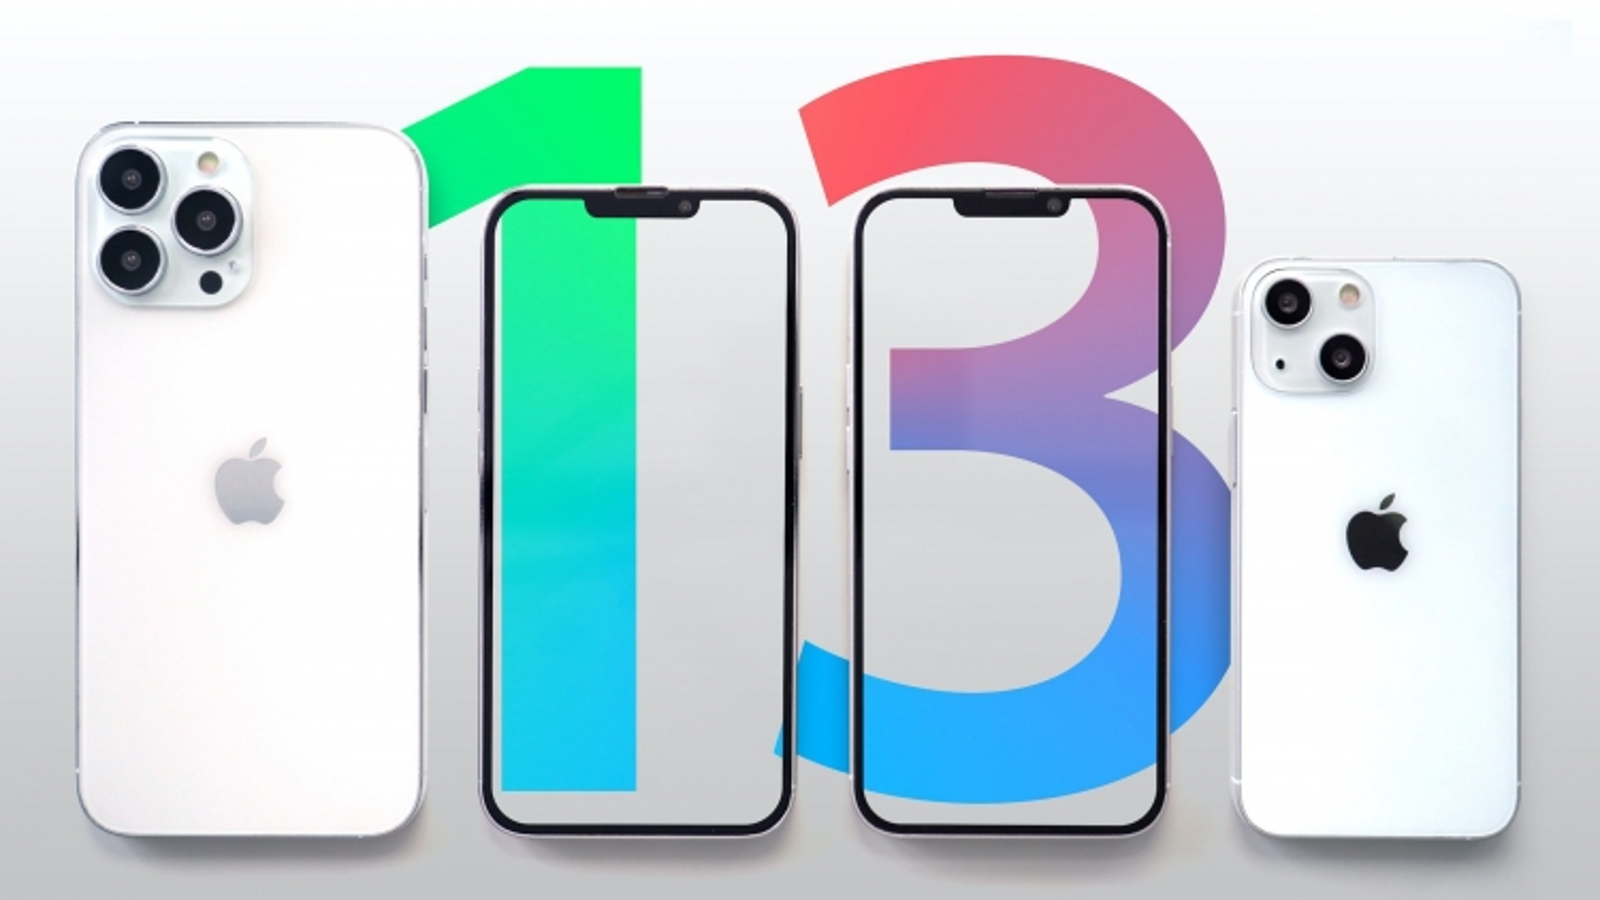 Luxshare sản xuất iPhone 13 Pro trong tháng này